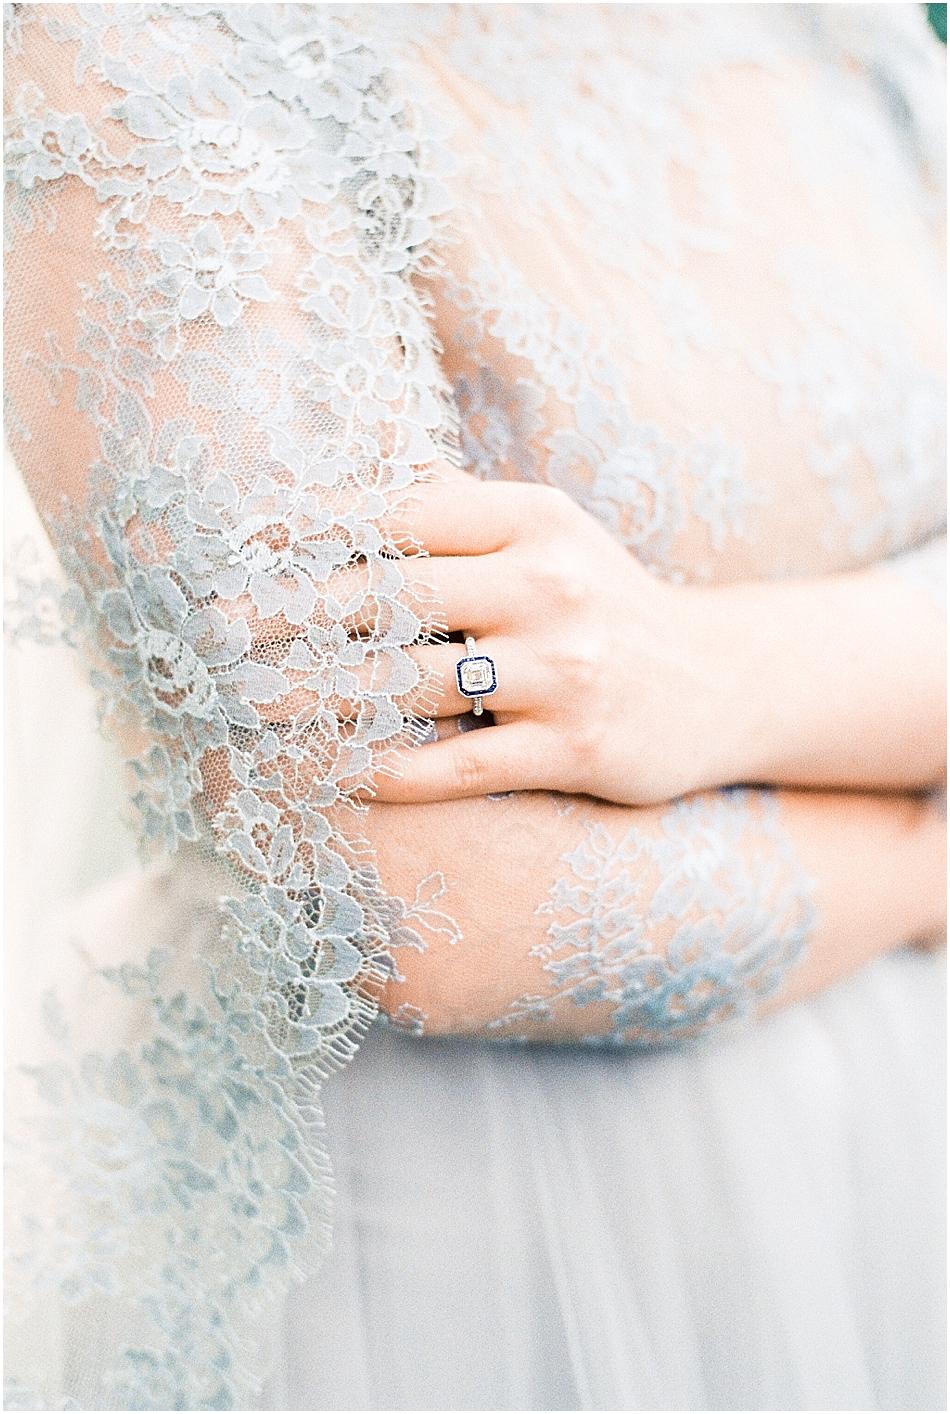 Chandler Bridal   Dallas Bride   Film   Brides of North Texas   Emilie Anne Photography   Dallas Photographer-15.jpg